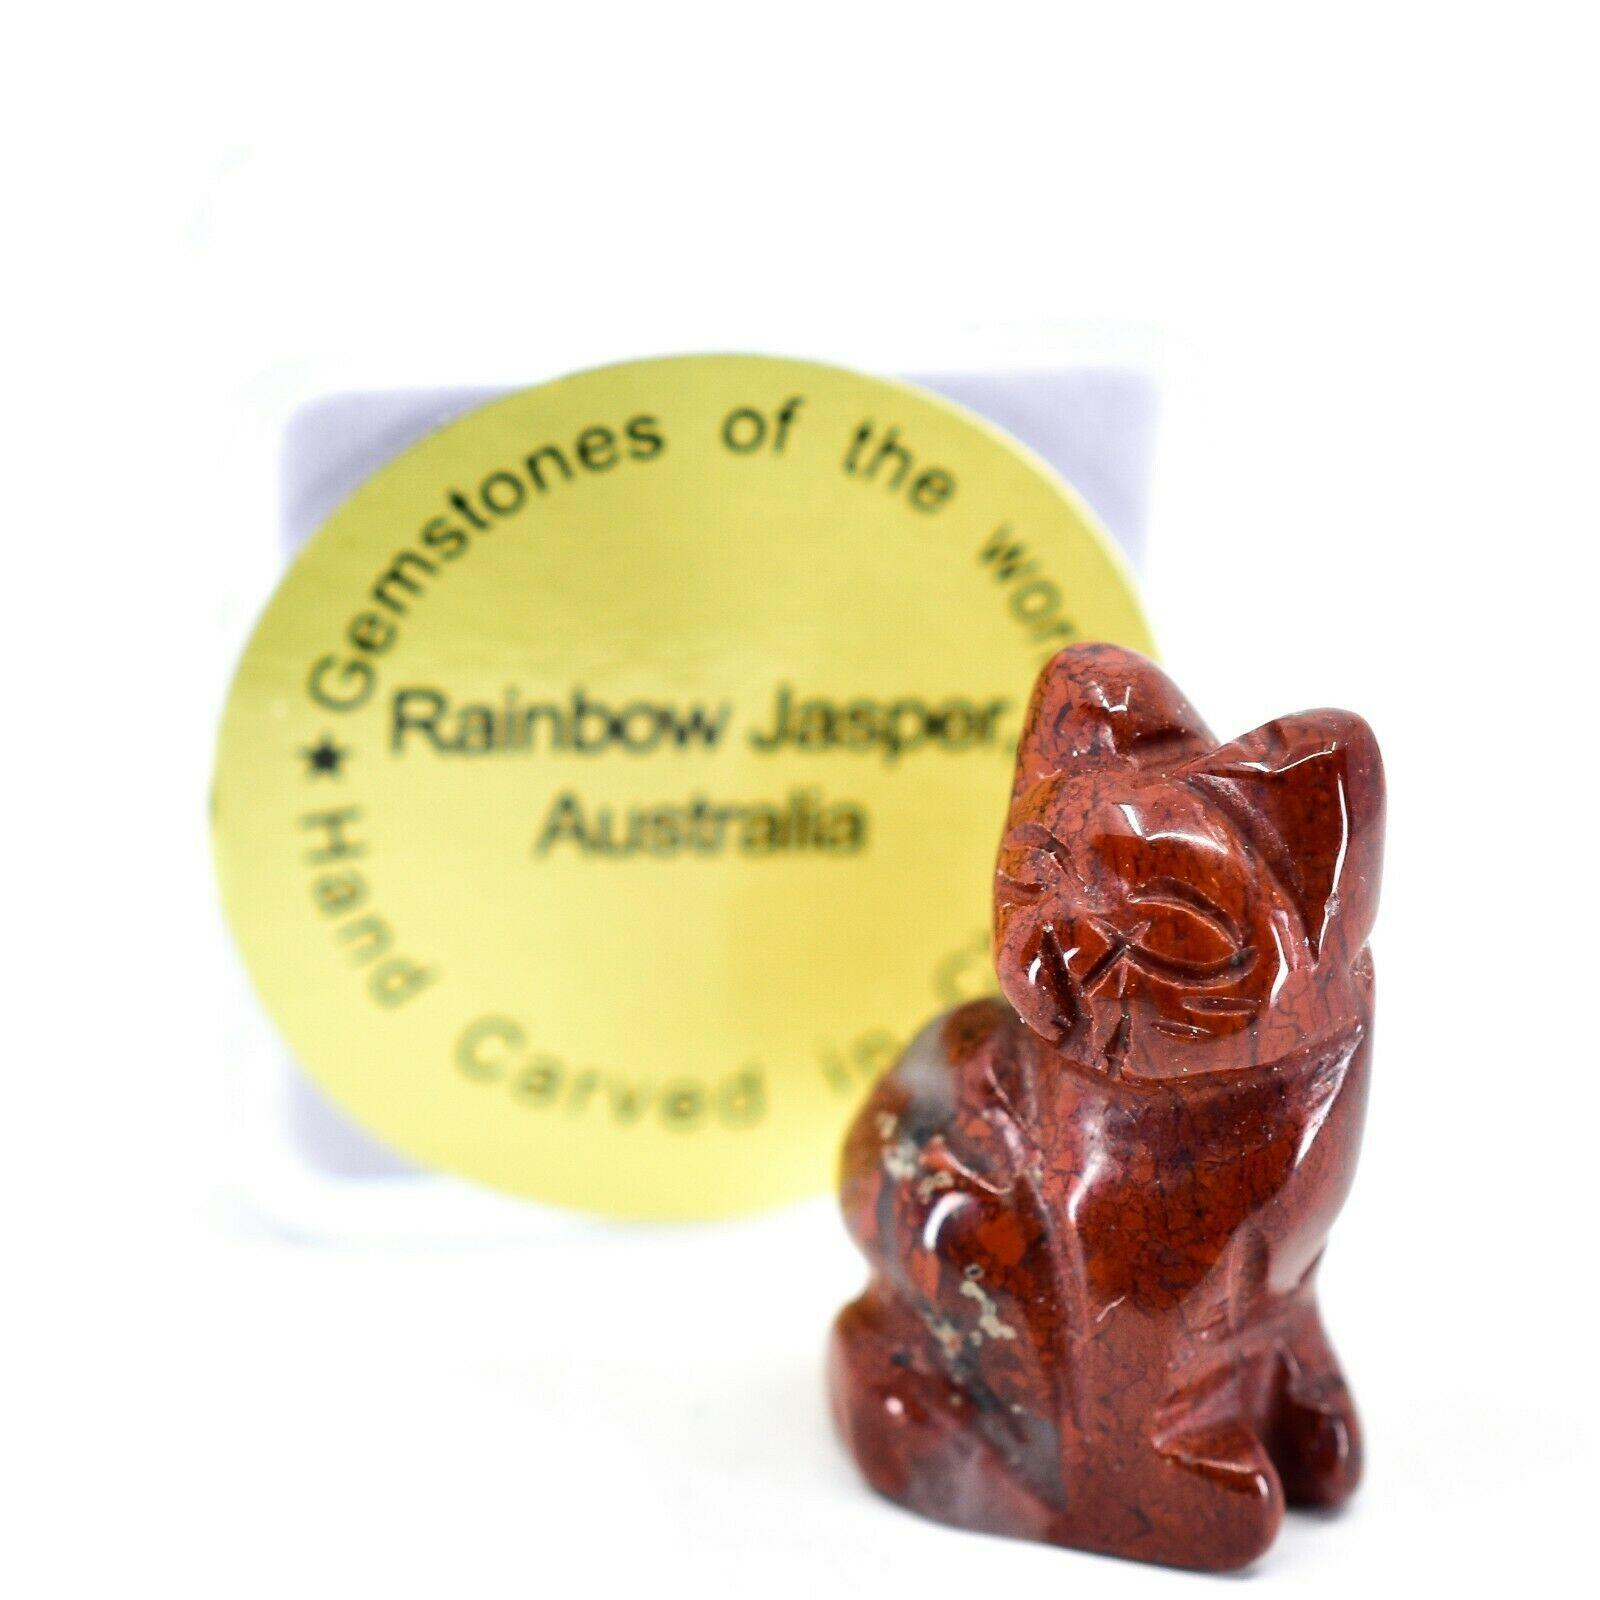 Rainbow Jasper Gemstone Tiny Miniature Kitty Cat Figurine Hand Carved in China